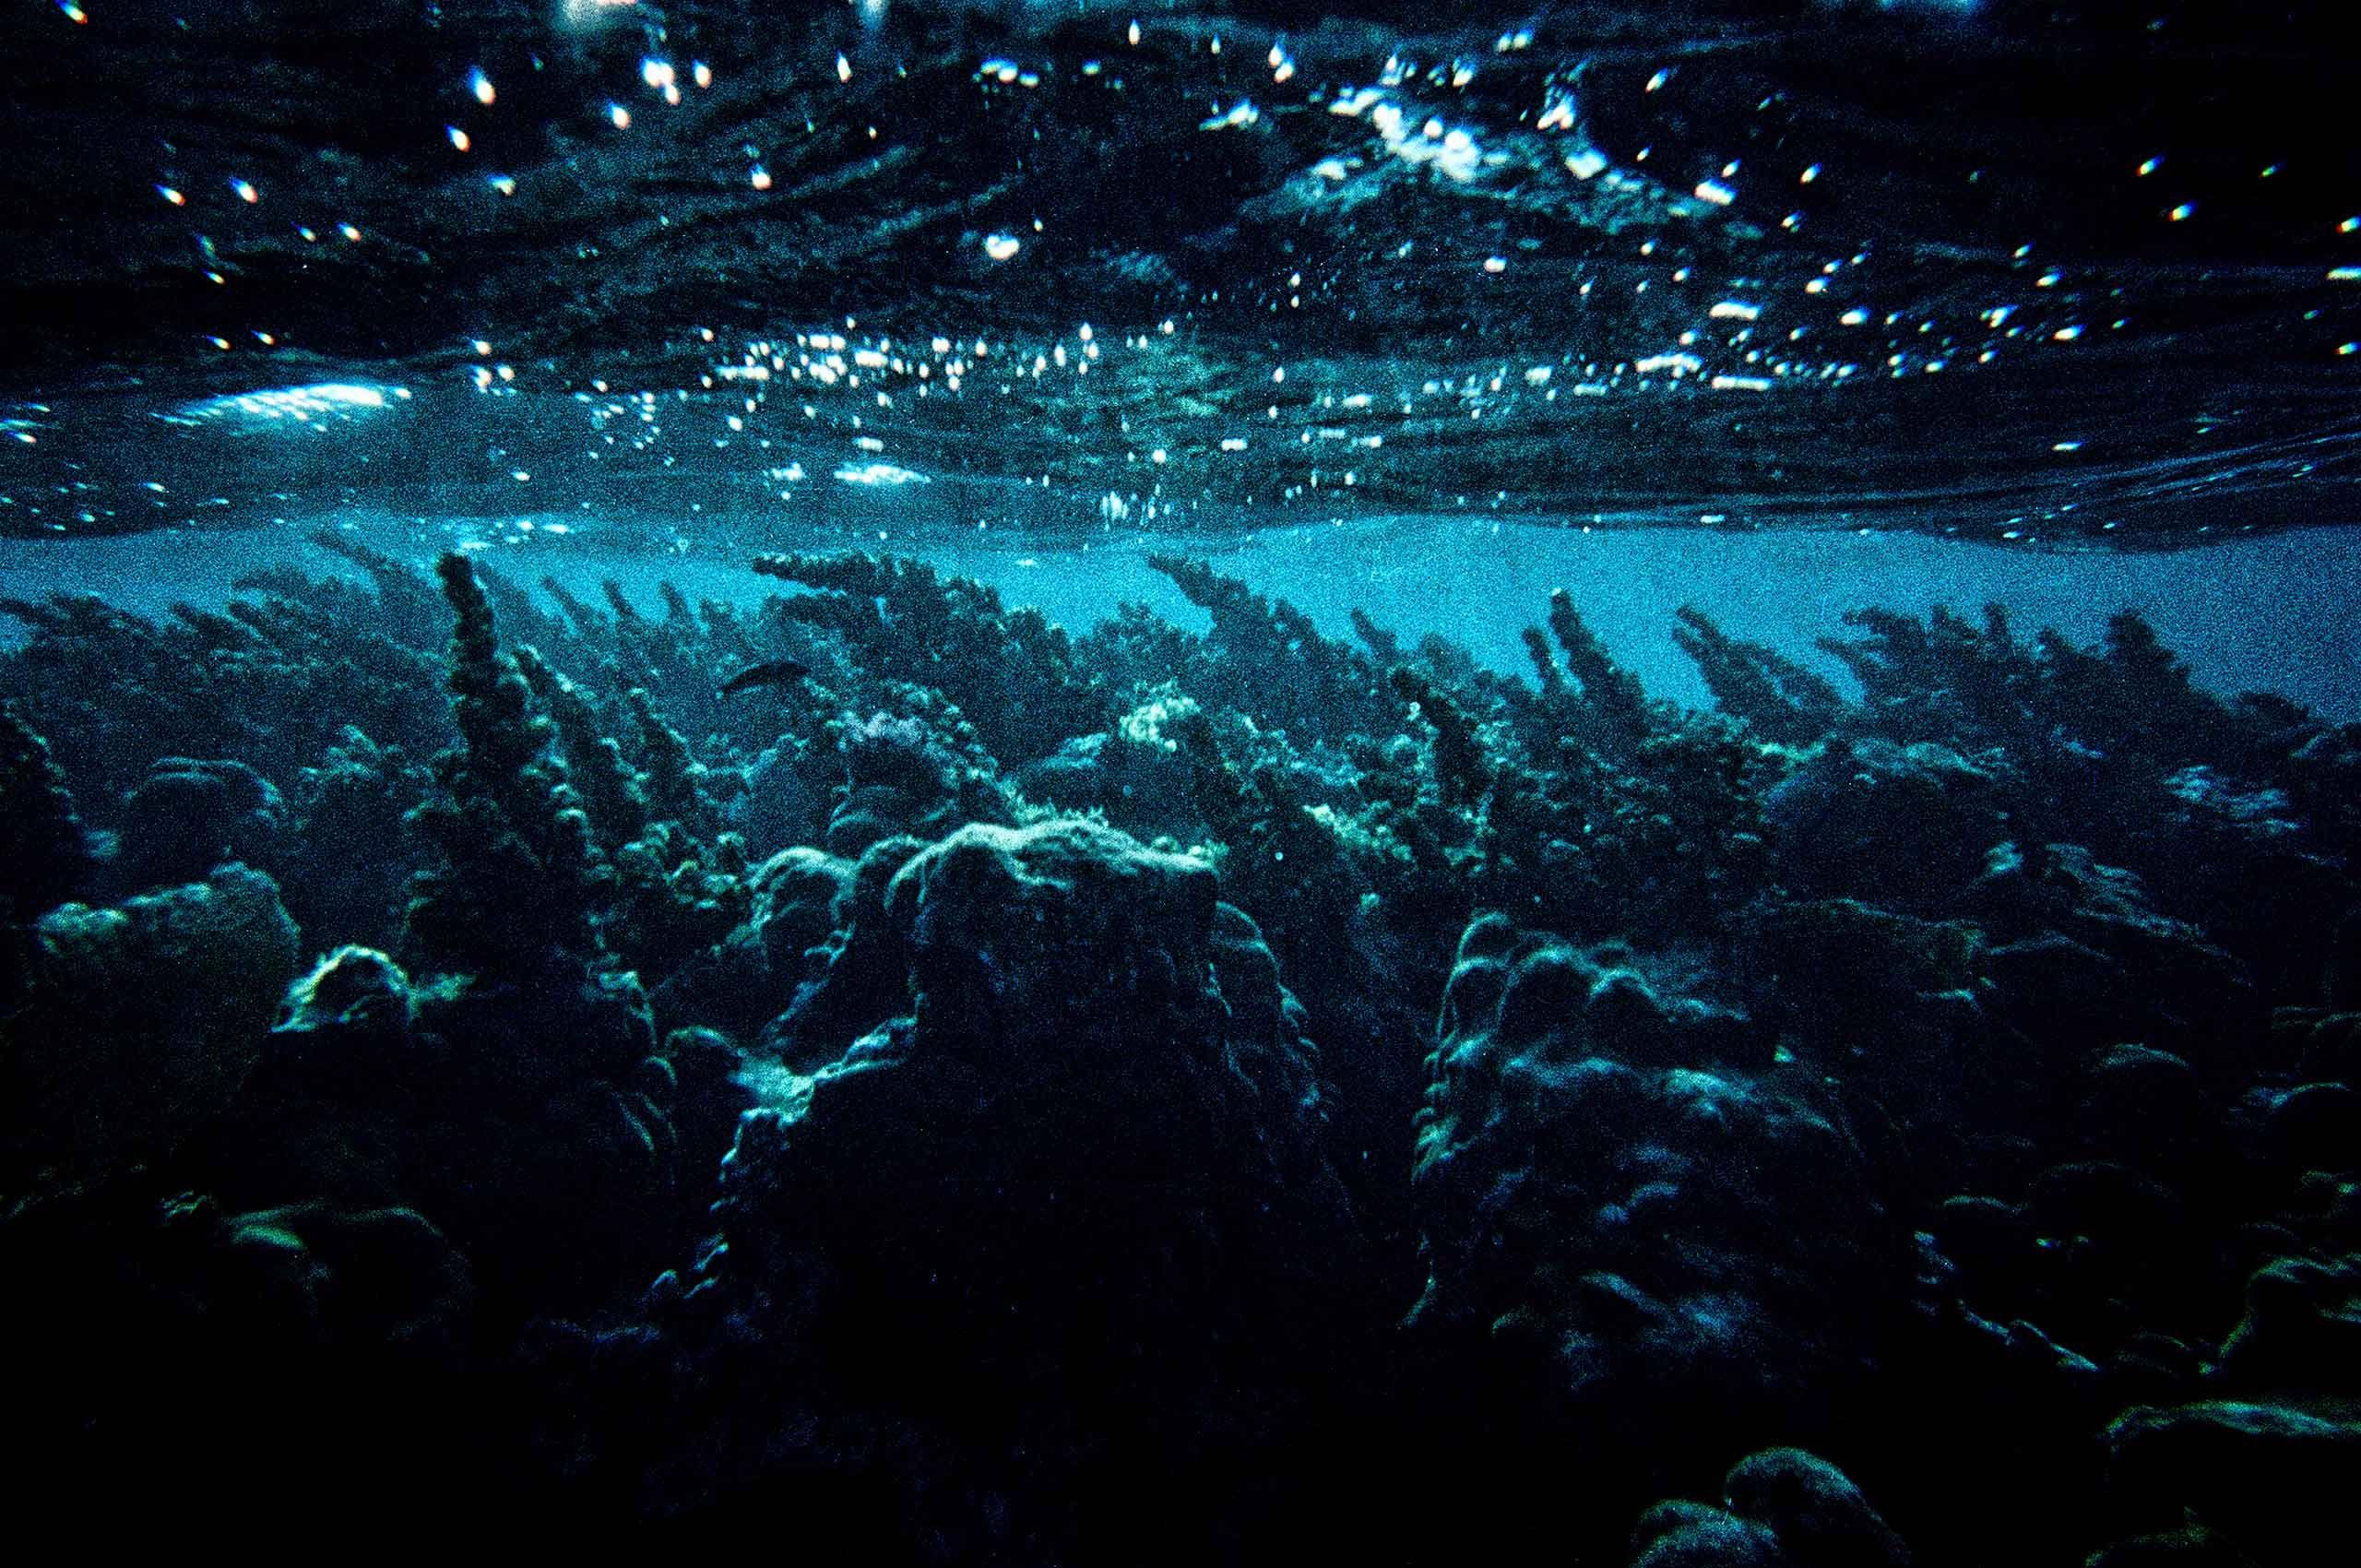 Underwater-Cenote-Mexico-by-HenrikOlundPhotography.jpg